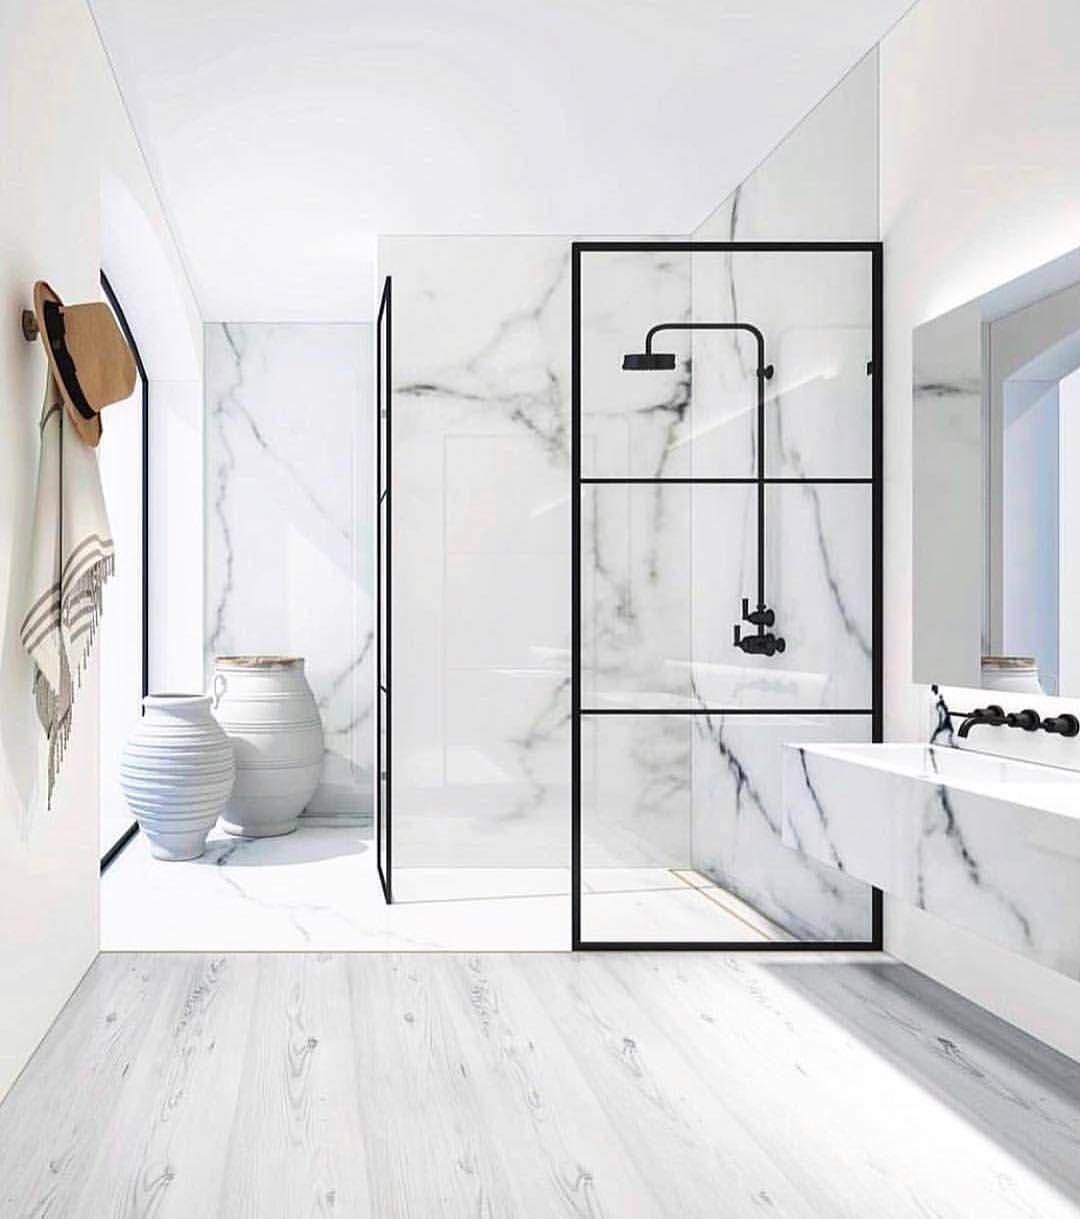 Style Forecast Ogee Drop Showers Installation Gallery Fireclay Tile Tile Bathroom Bathroom Tile Diy Bathroom Interior